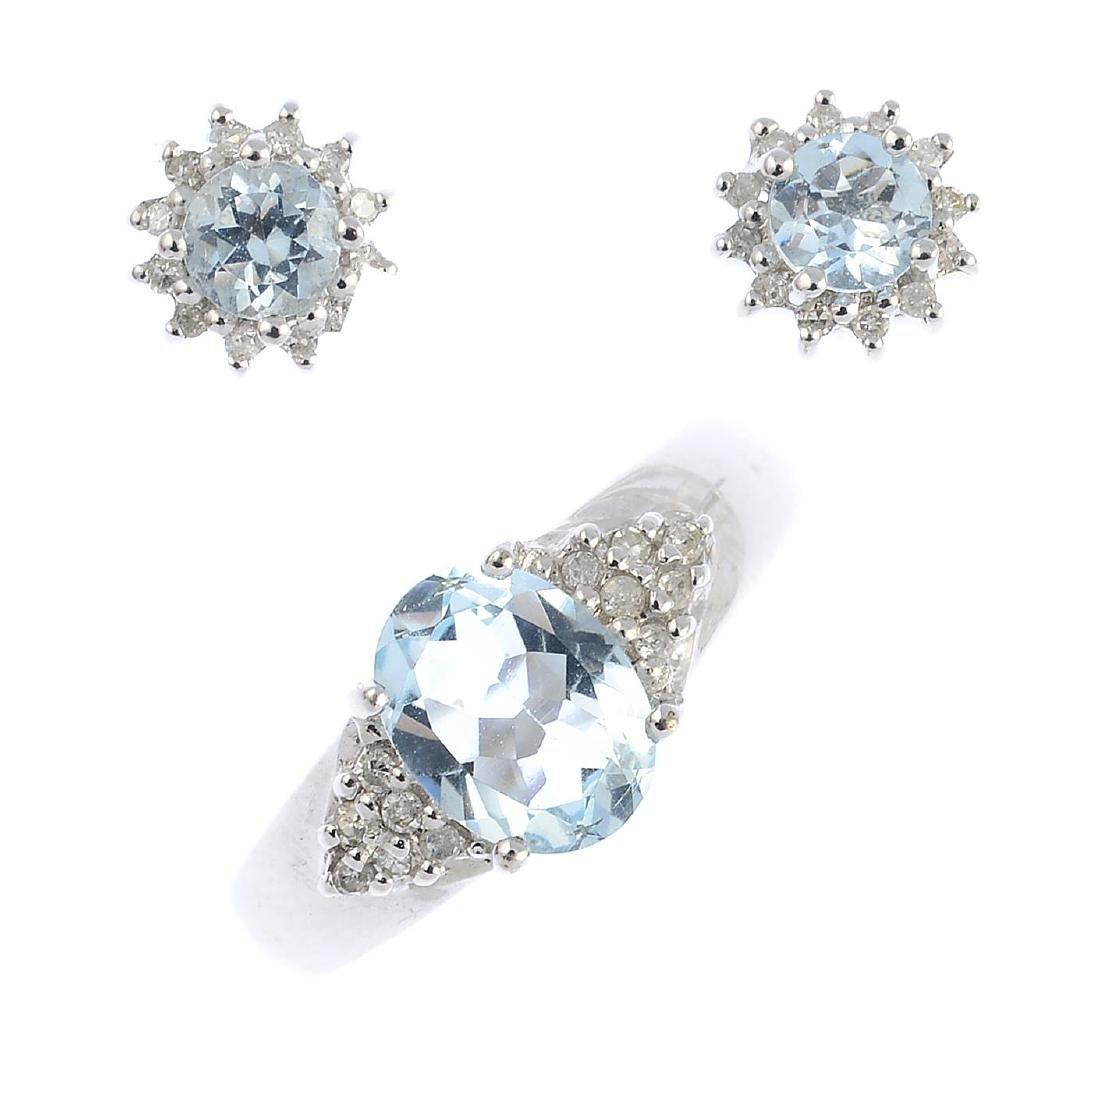 A selection of aquamarine and diamond jewellery To